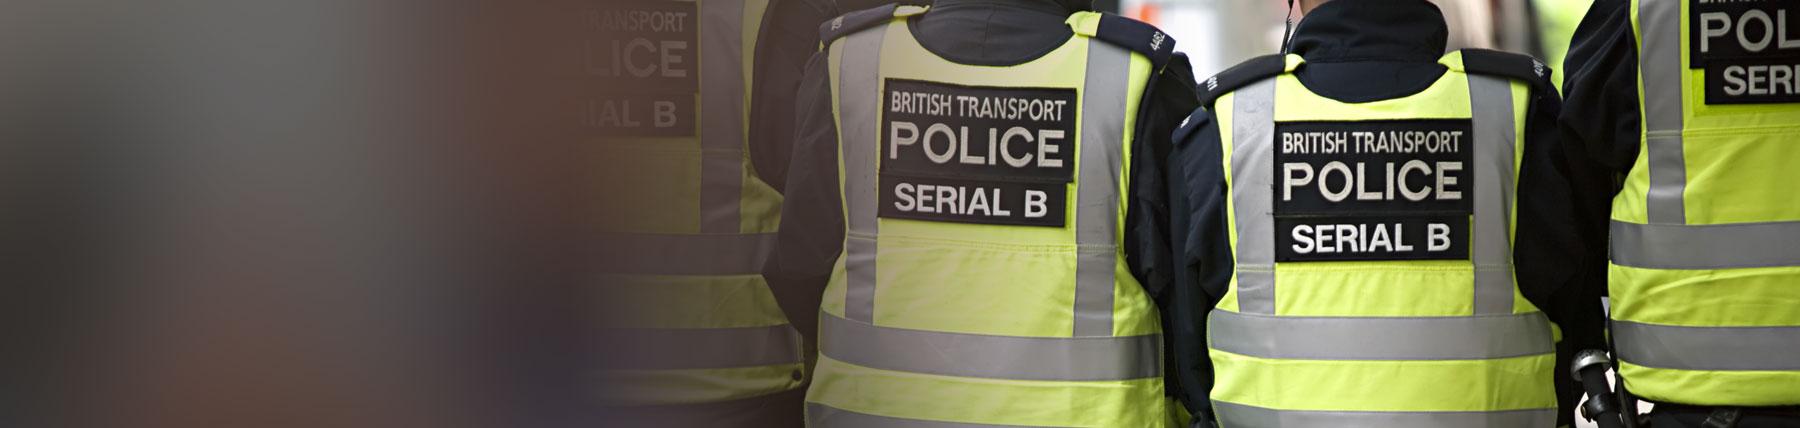 British transport police btp - British transport police press office ...